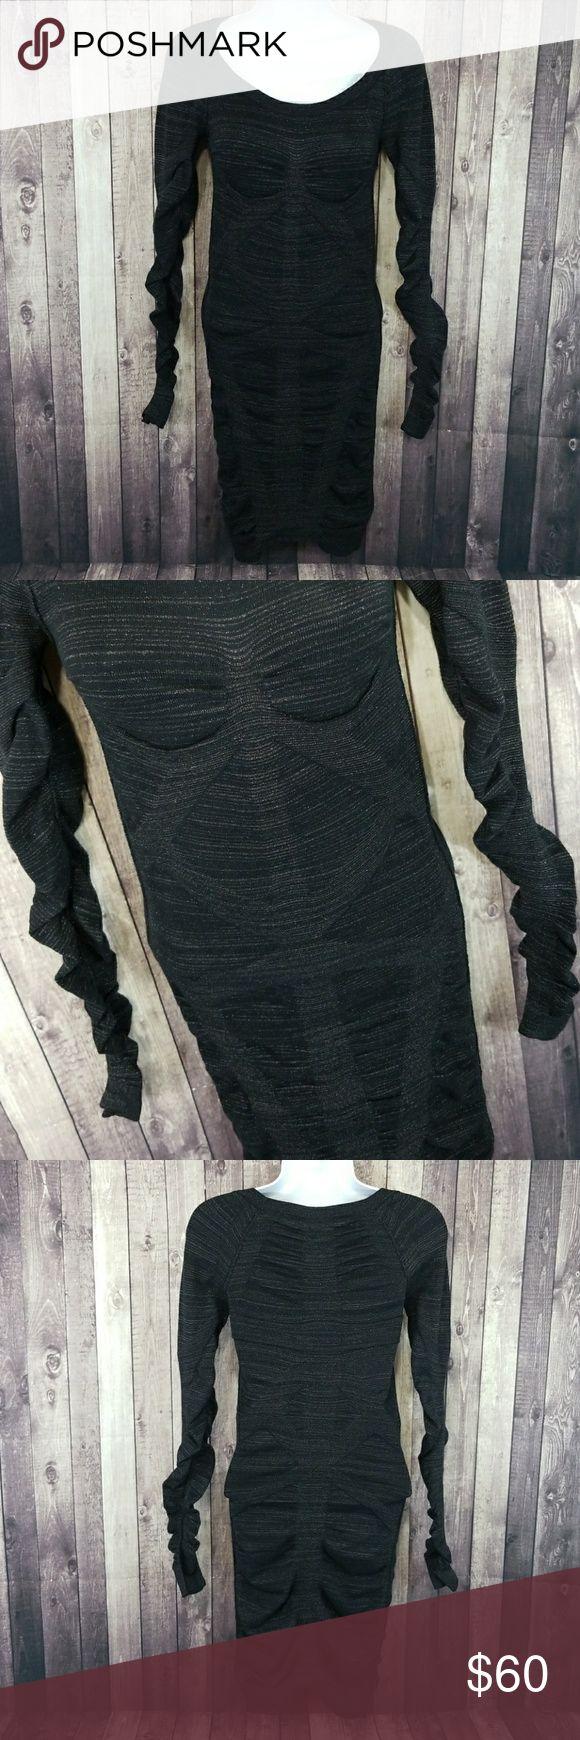 "All Saints Vikrama long sleeve bandage dress EUC All Saints black with silver metallic fibers throughout Vikrama body on bandage dress. Long sleeves. 69% cotton, 18% nylon, 11% polyester, 2% elastane. Lay flat measurements: approximately 12"" pit to pit, 35"" long. All Saints Dresses Long Sleeve"